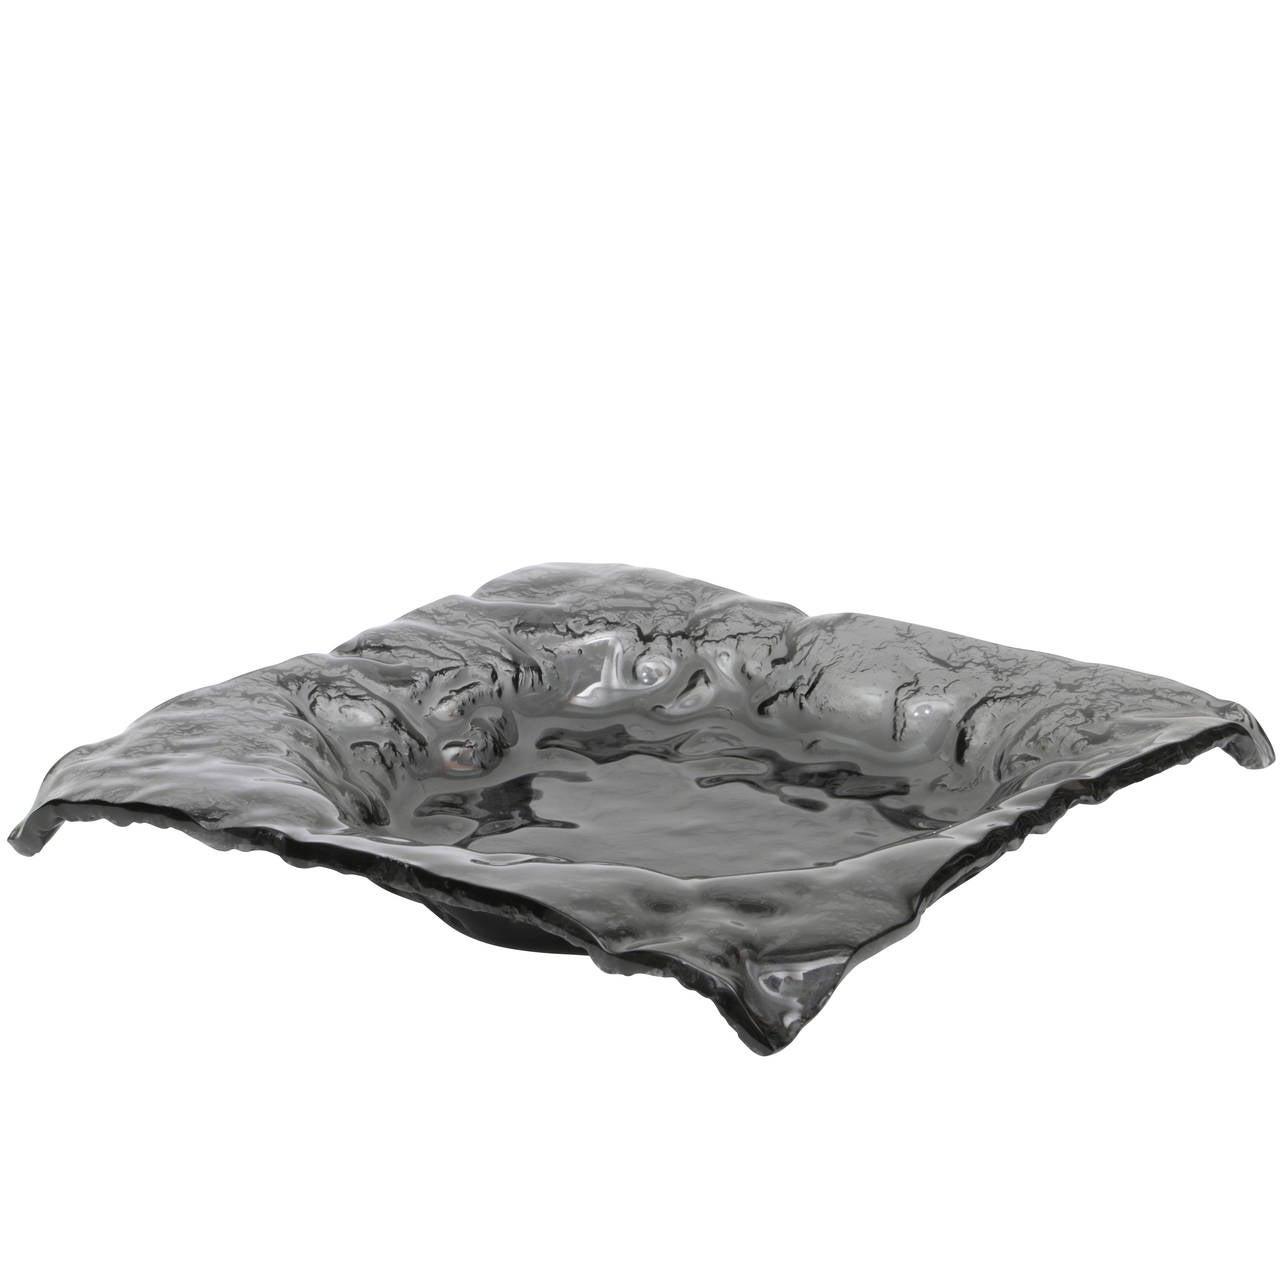 Black Molten Art Glass Large-Scale Bowl or Centerpiece